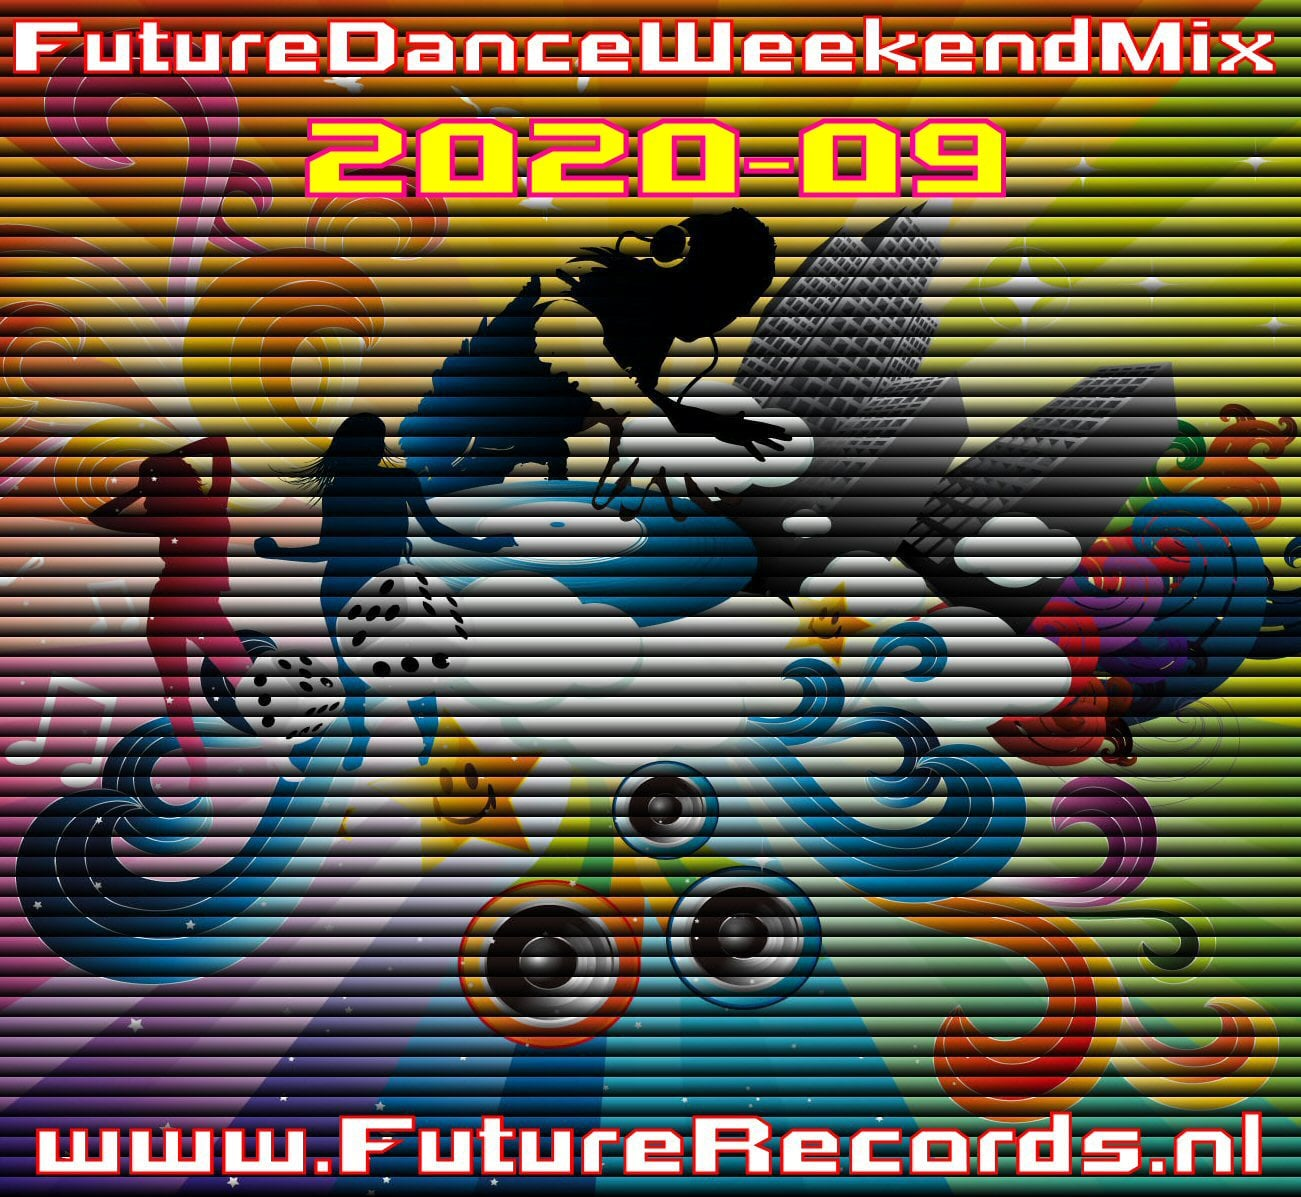 Future Dance Weekend Mix 2020-09